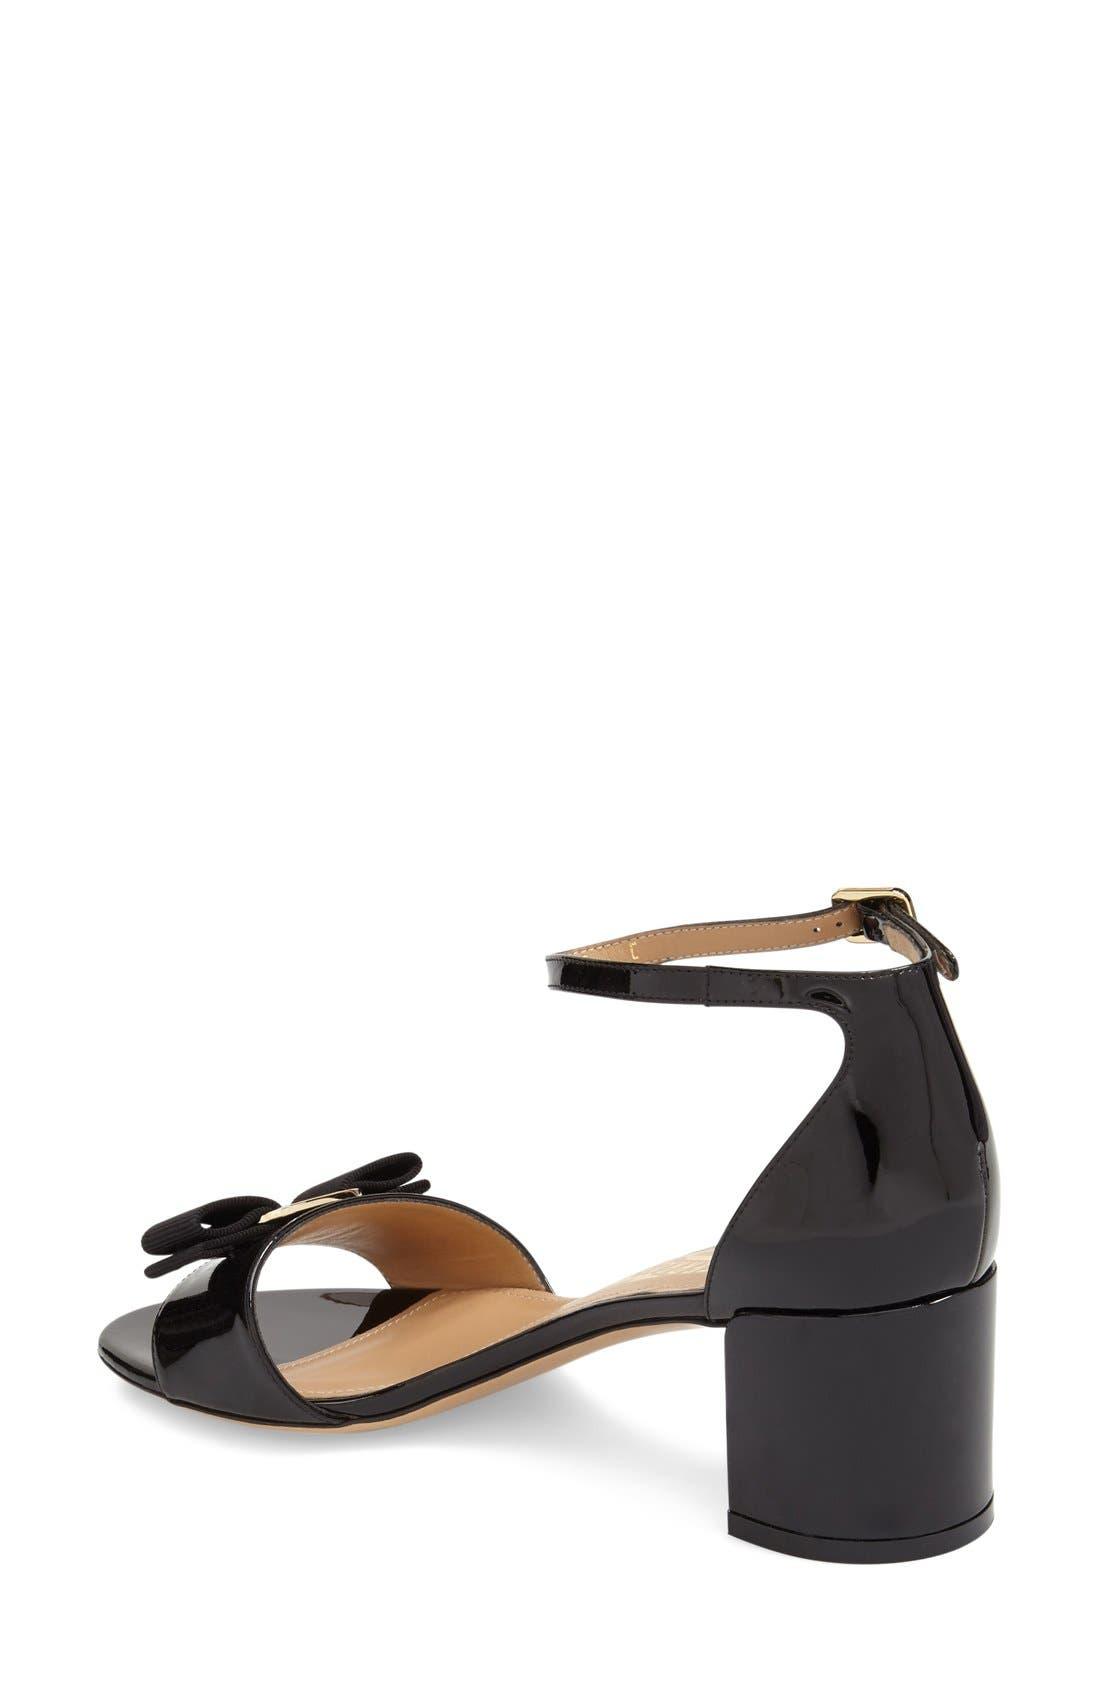 Gavina Block Heel Bow Sandal,                             Alternate thumbnail 2, color,                             Black Patent